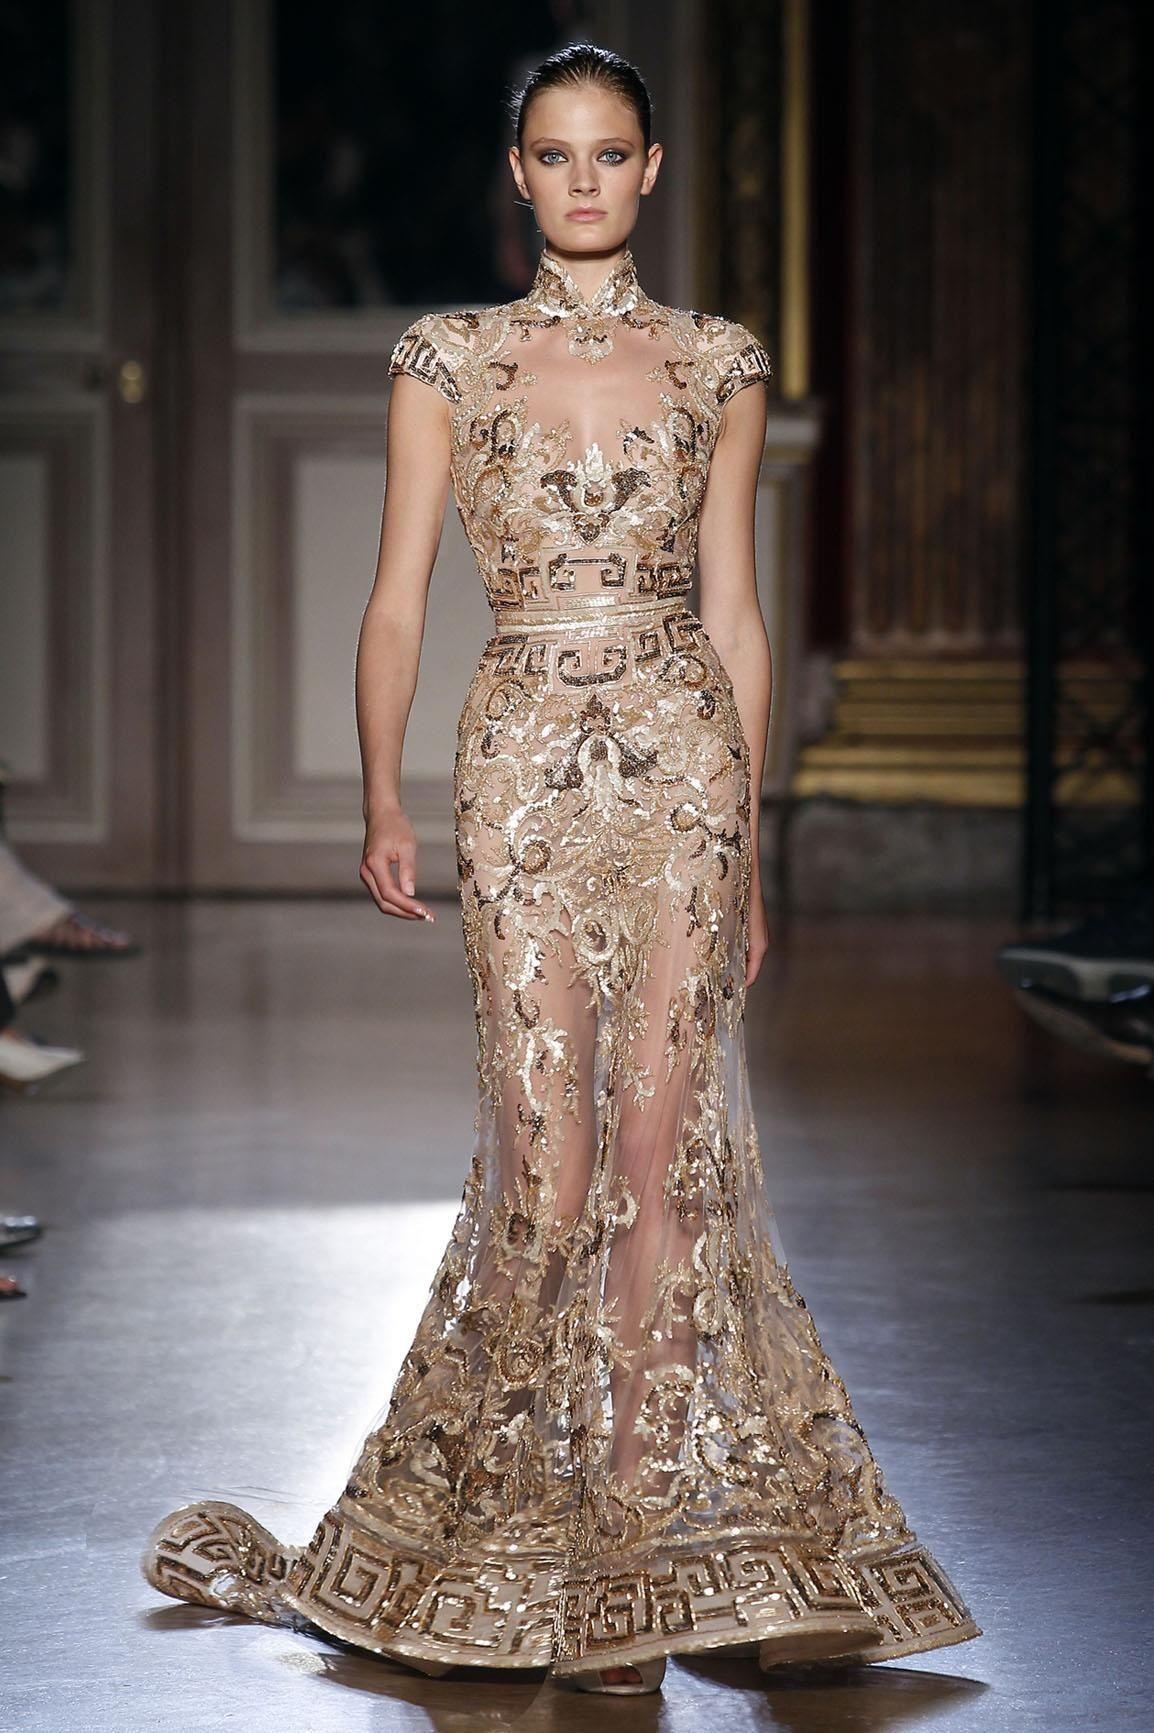 49fb939285f2 Zuhair Murad wonderful dress | My fav Zuhair Murad designs ! <3 in ...